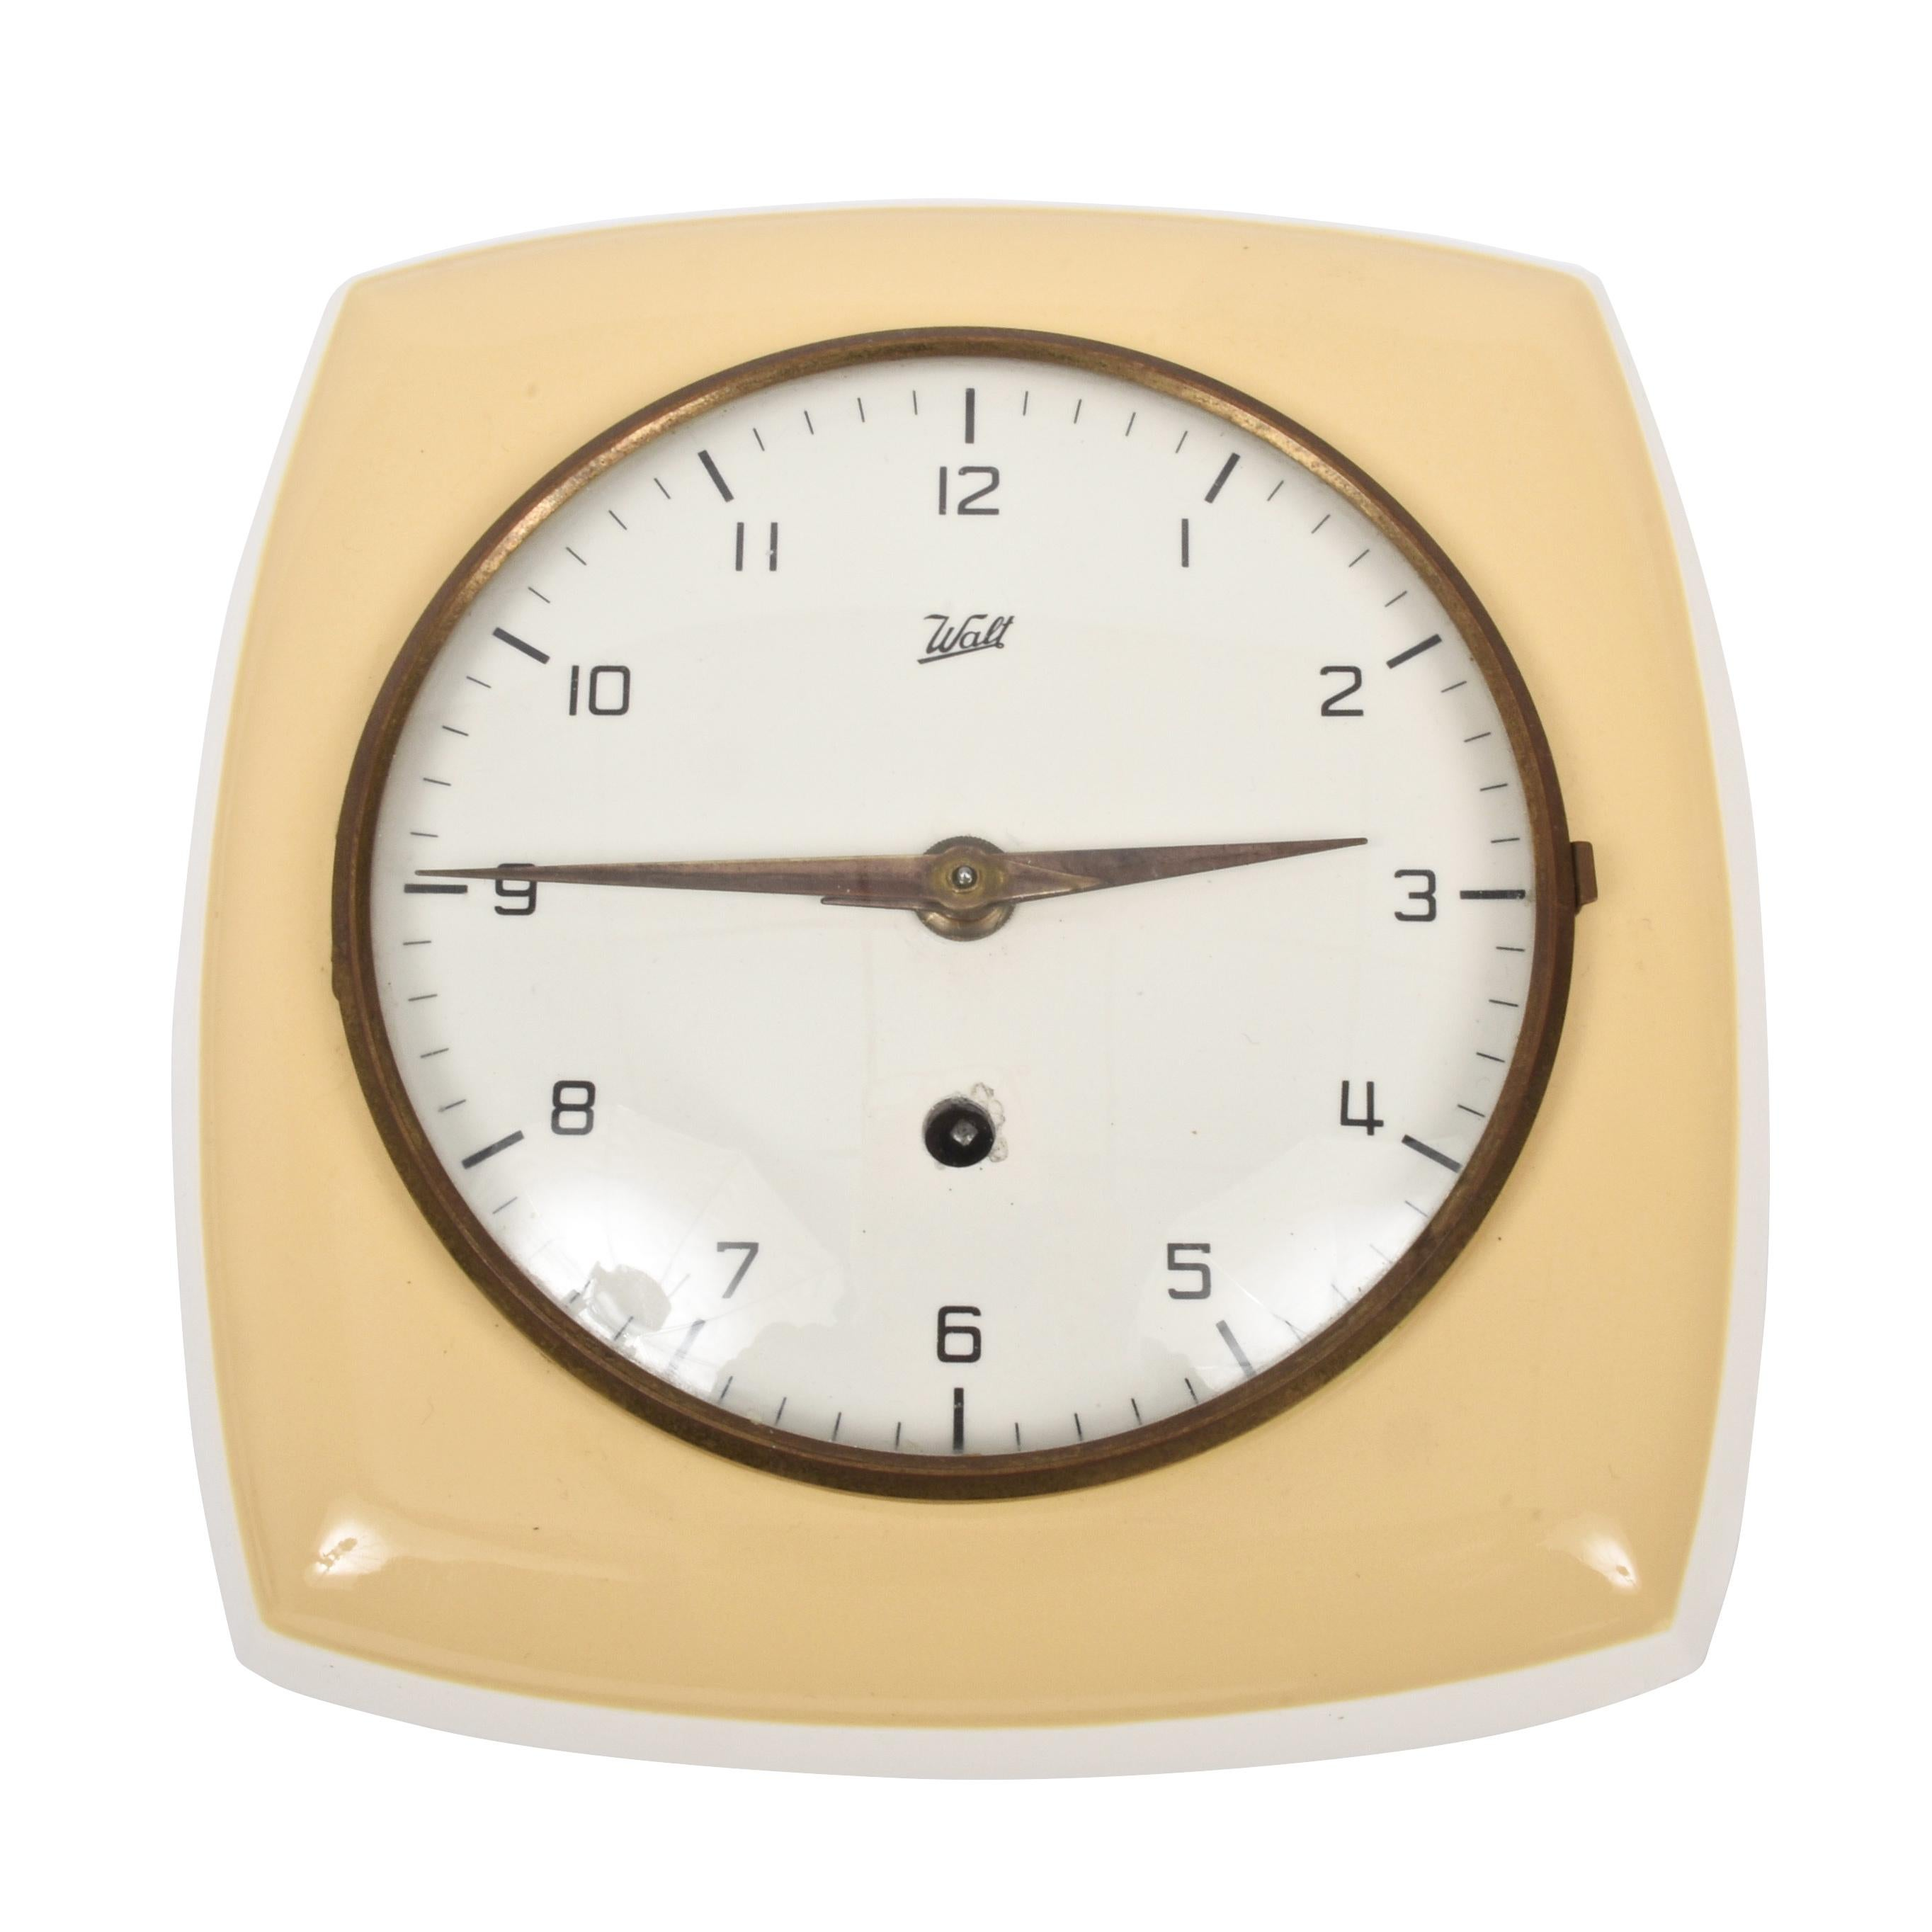 Midcentury Ceramic Wall Clock by Walt, Germany, 1950s